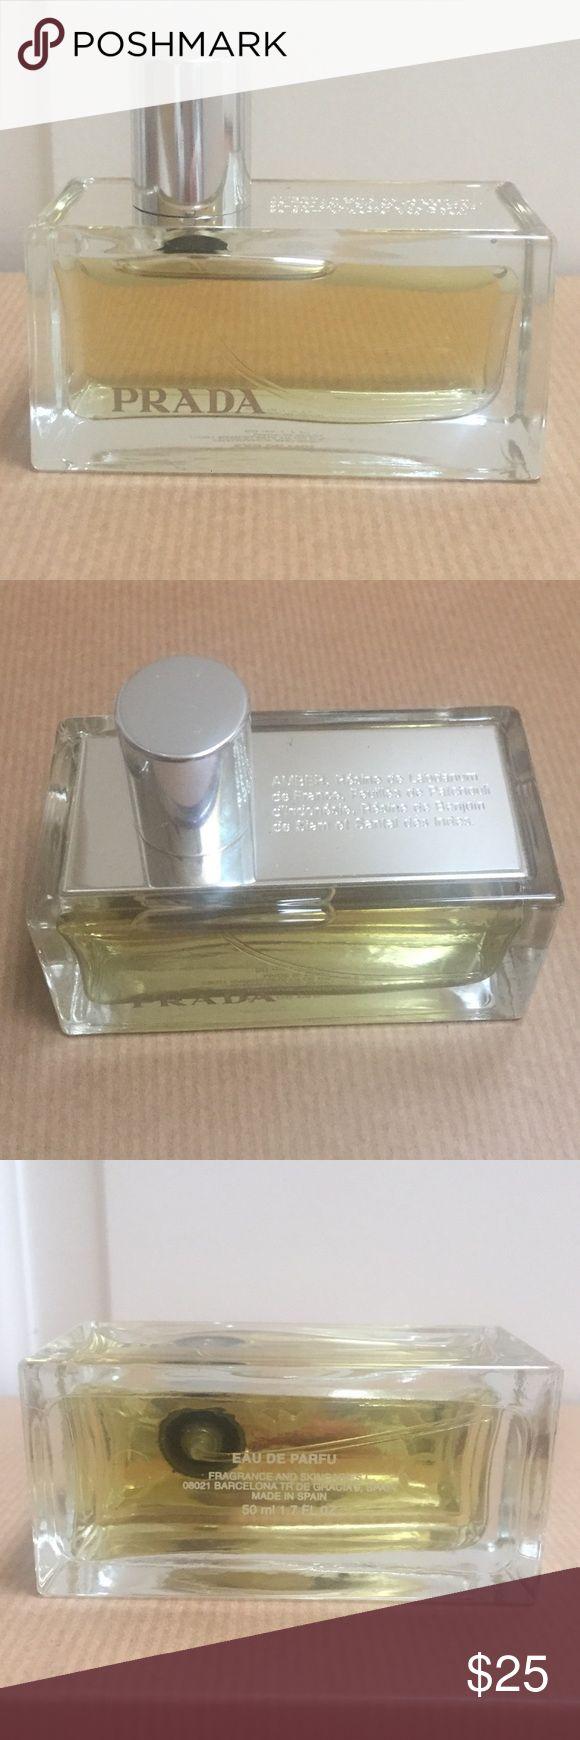 Prada Amber Prada Amber Eau de Parfum. Used a few times, but still a very full bottle. Prada Makeup